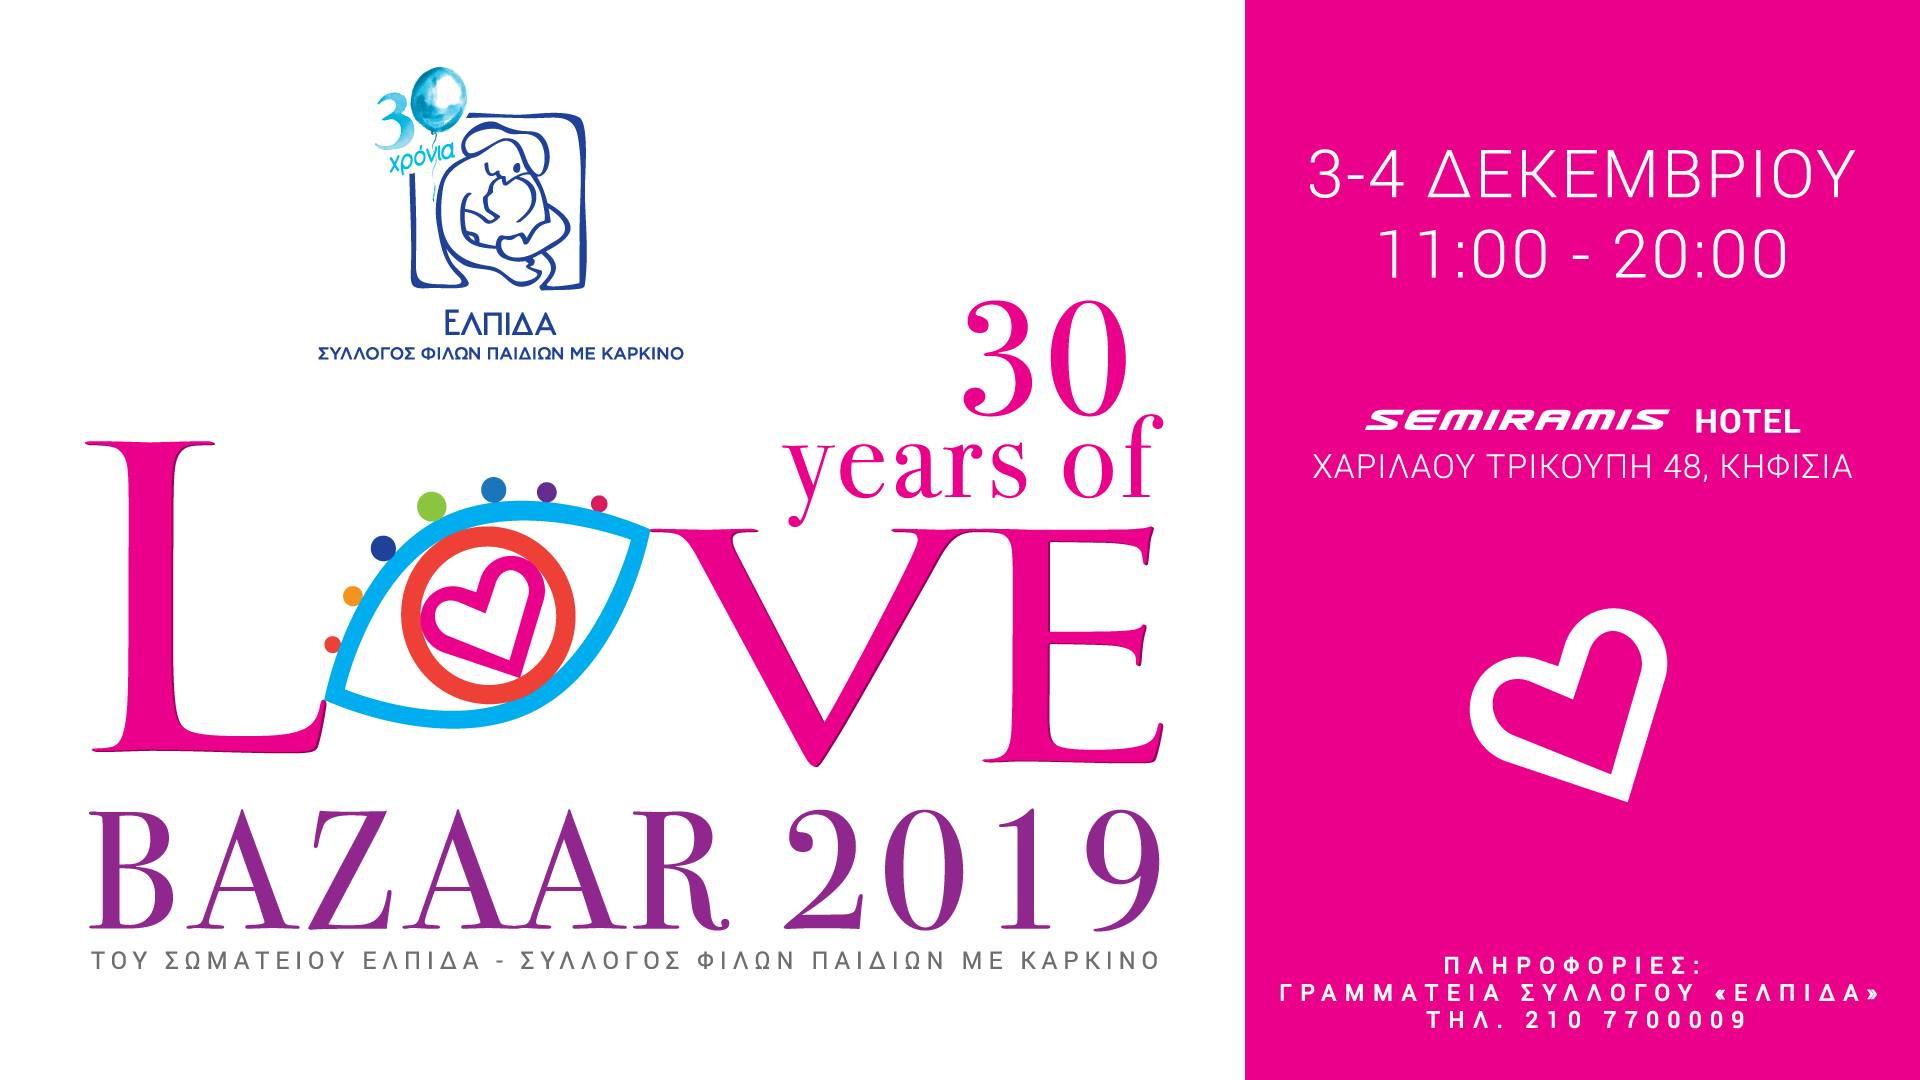 30 years of love